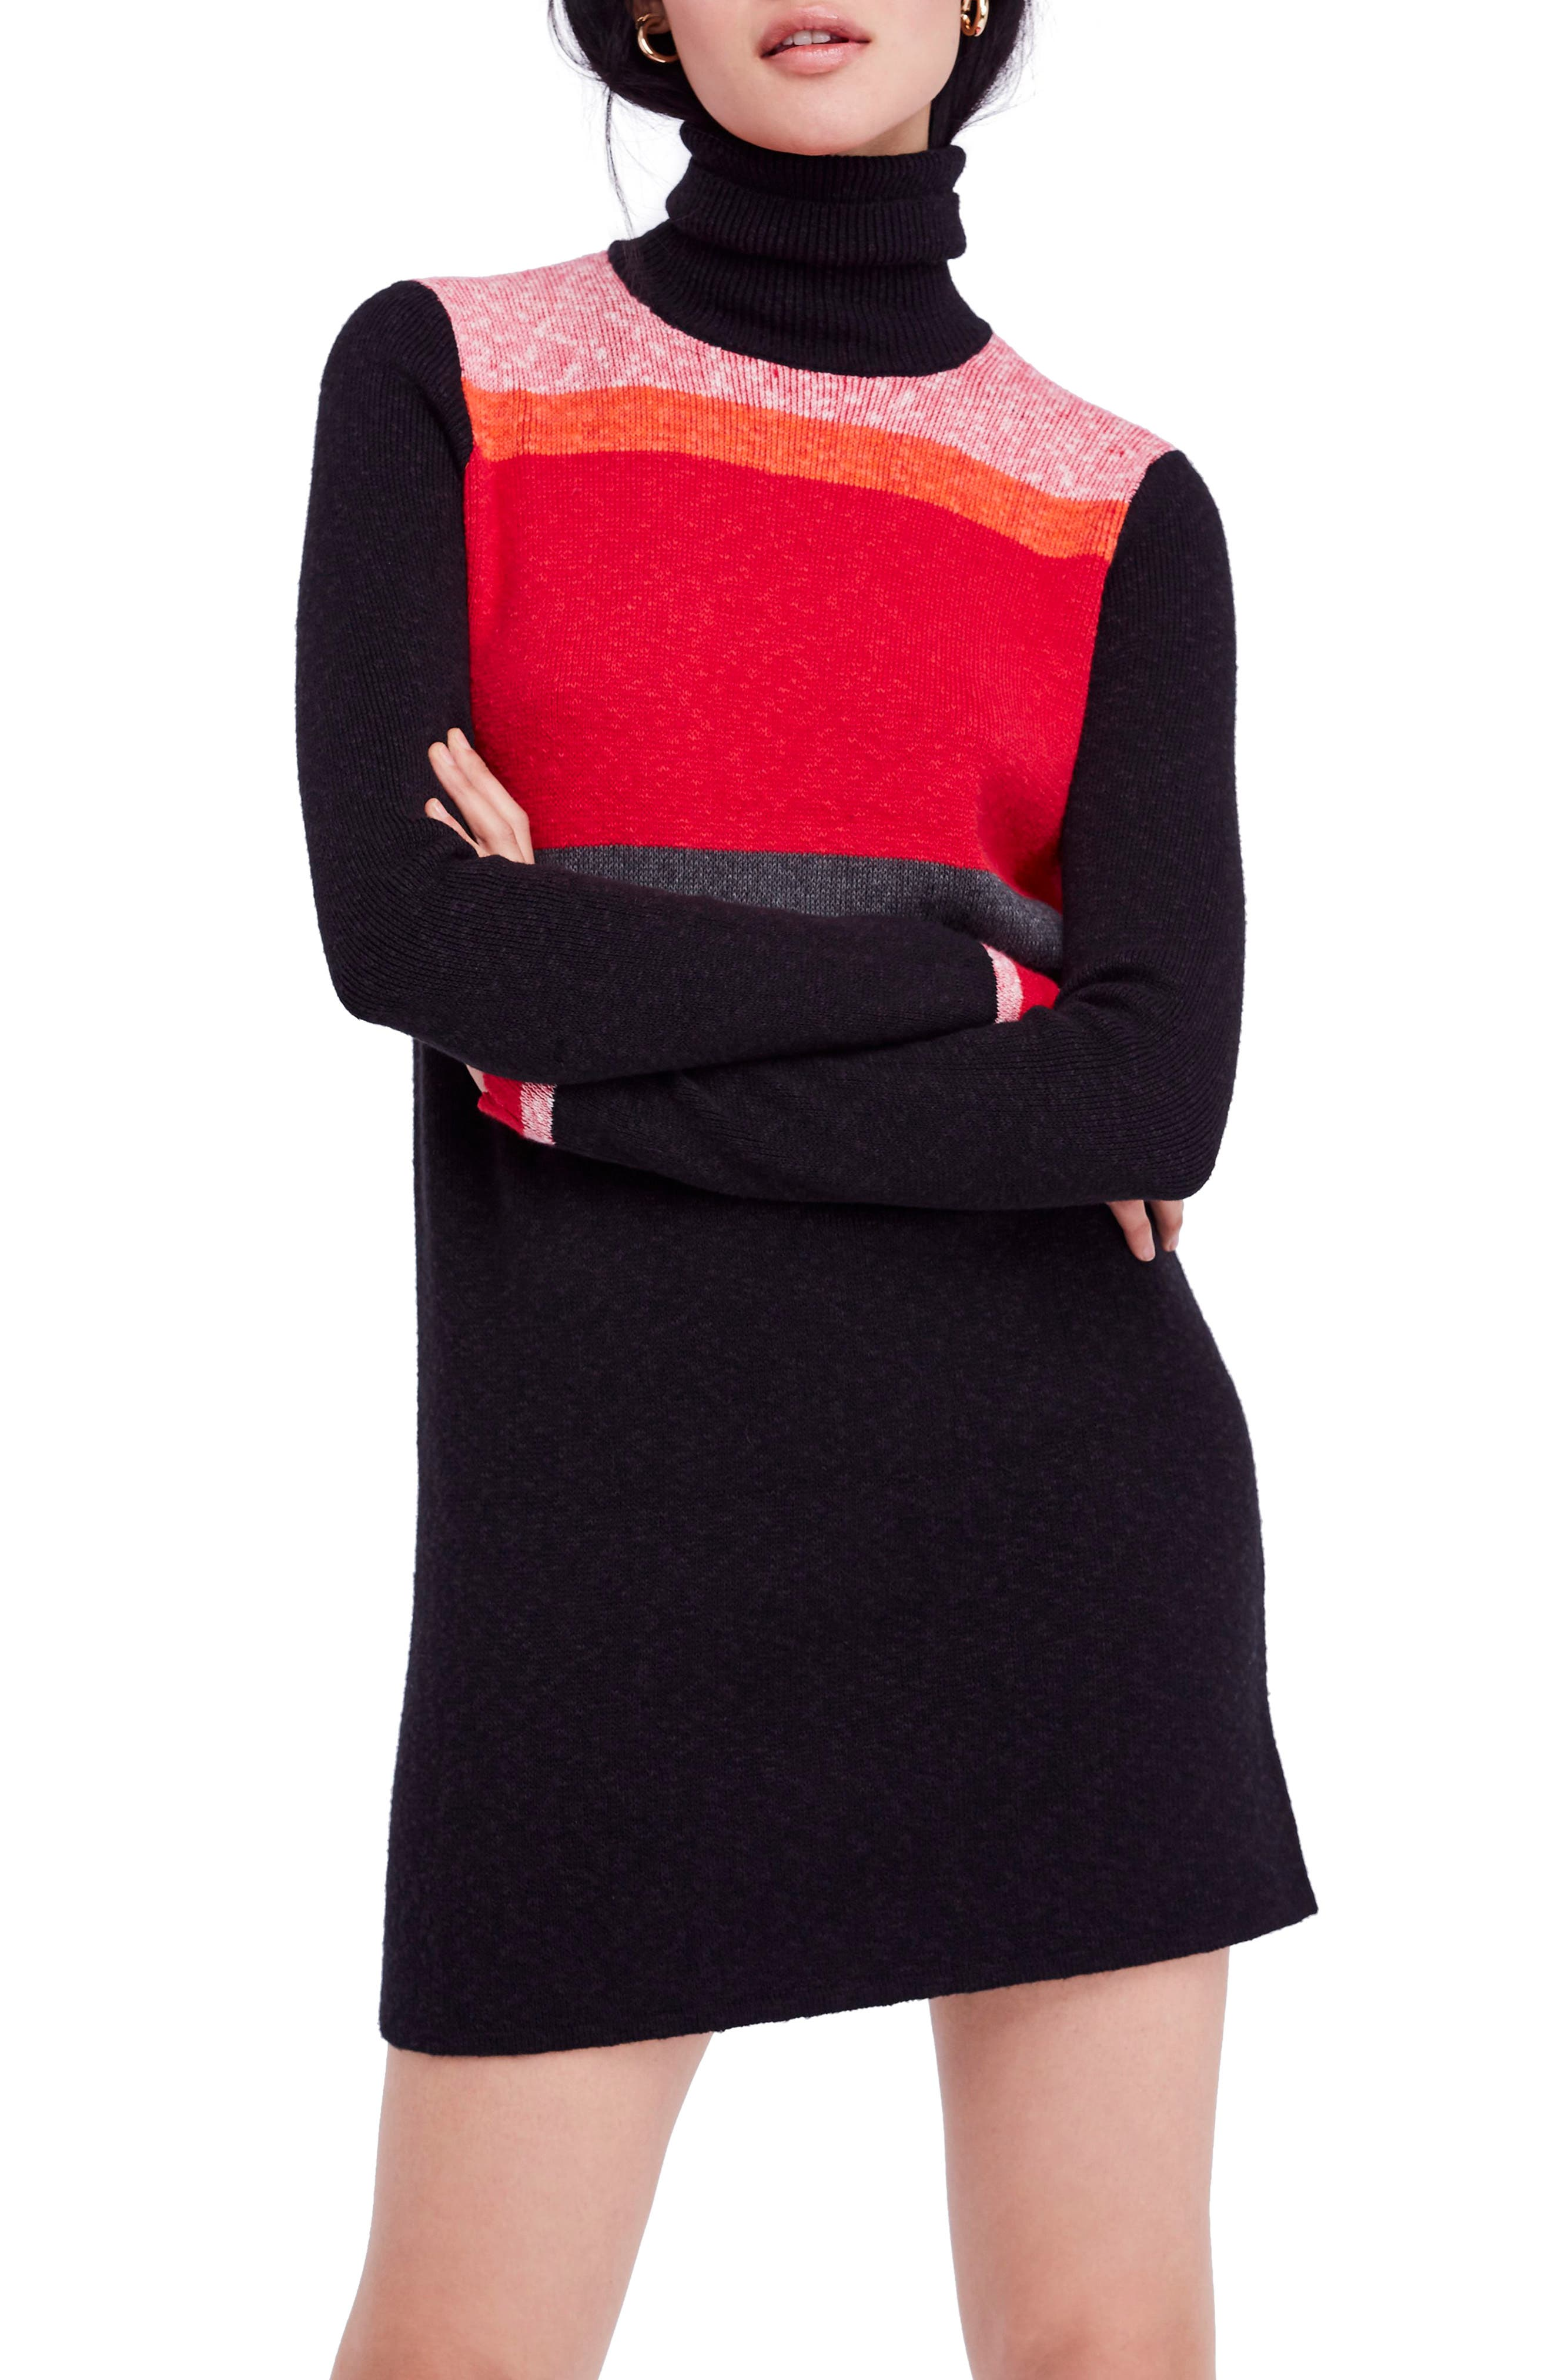 Winter Break Sweater Dress,                             Main thumbnail 1, color,                             001